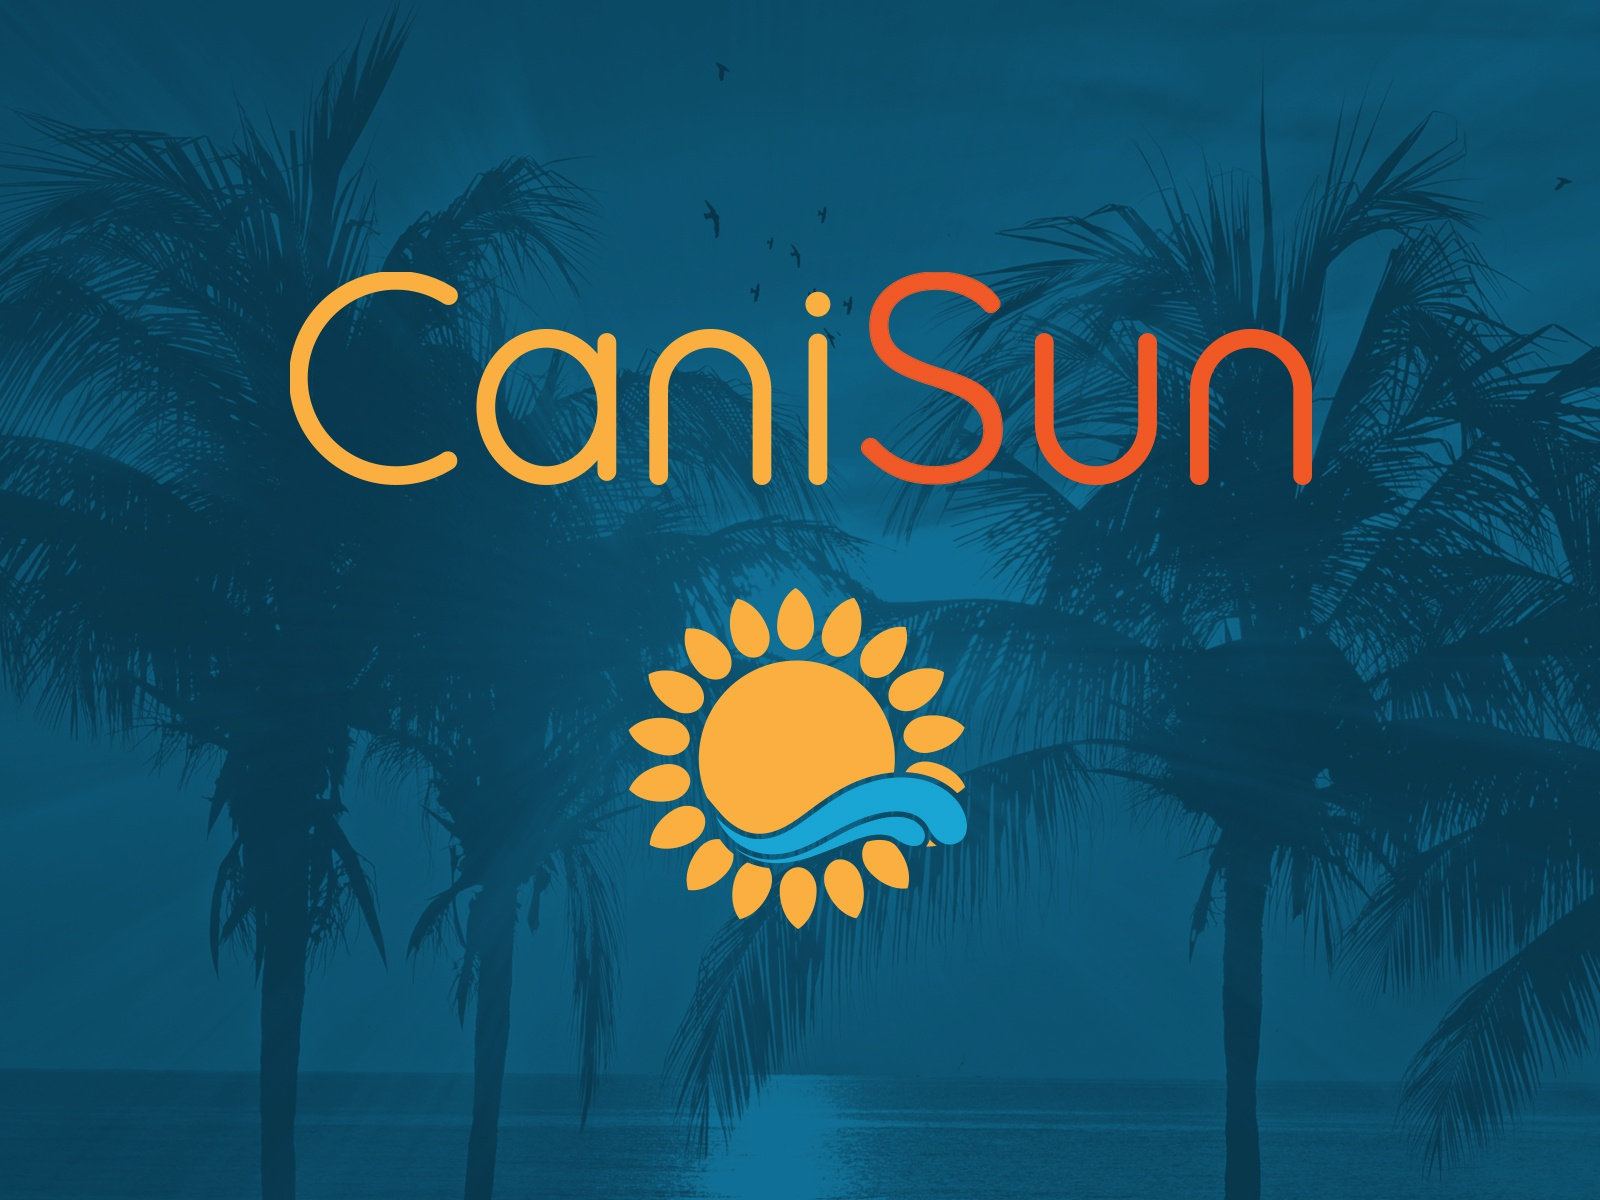 Canisun logo background